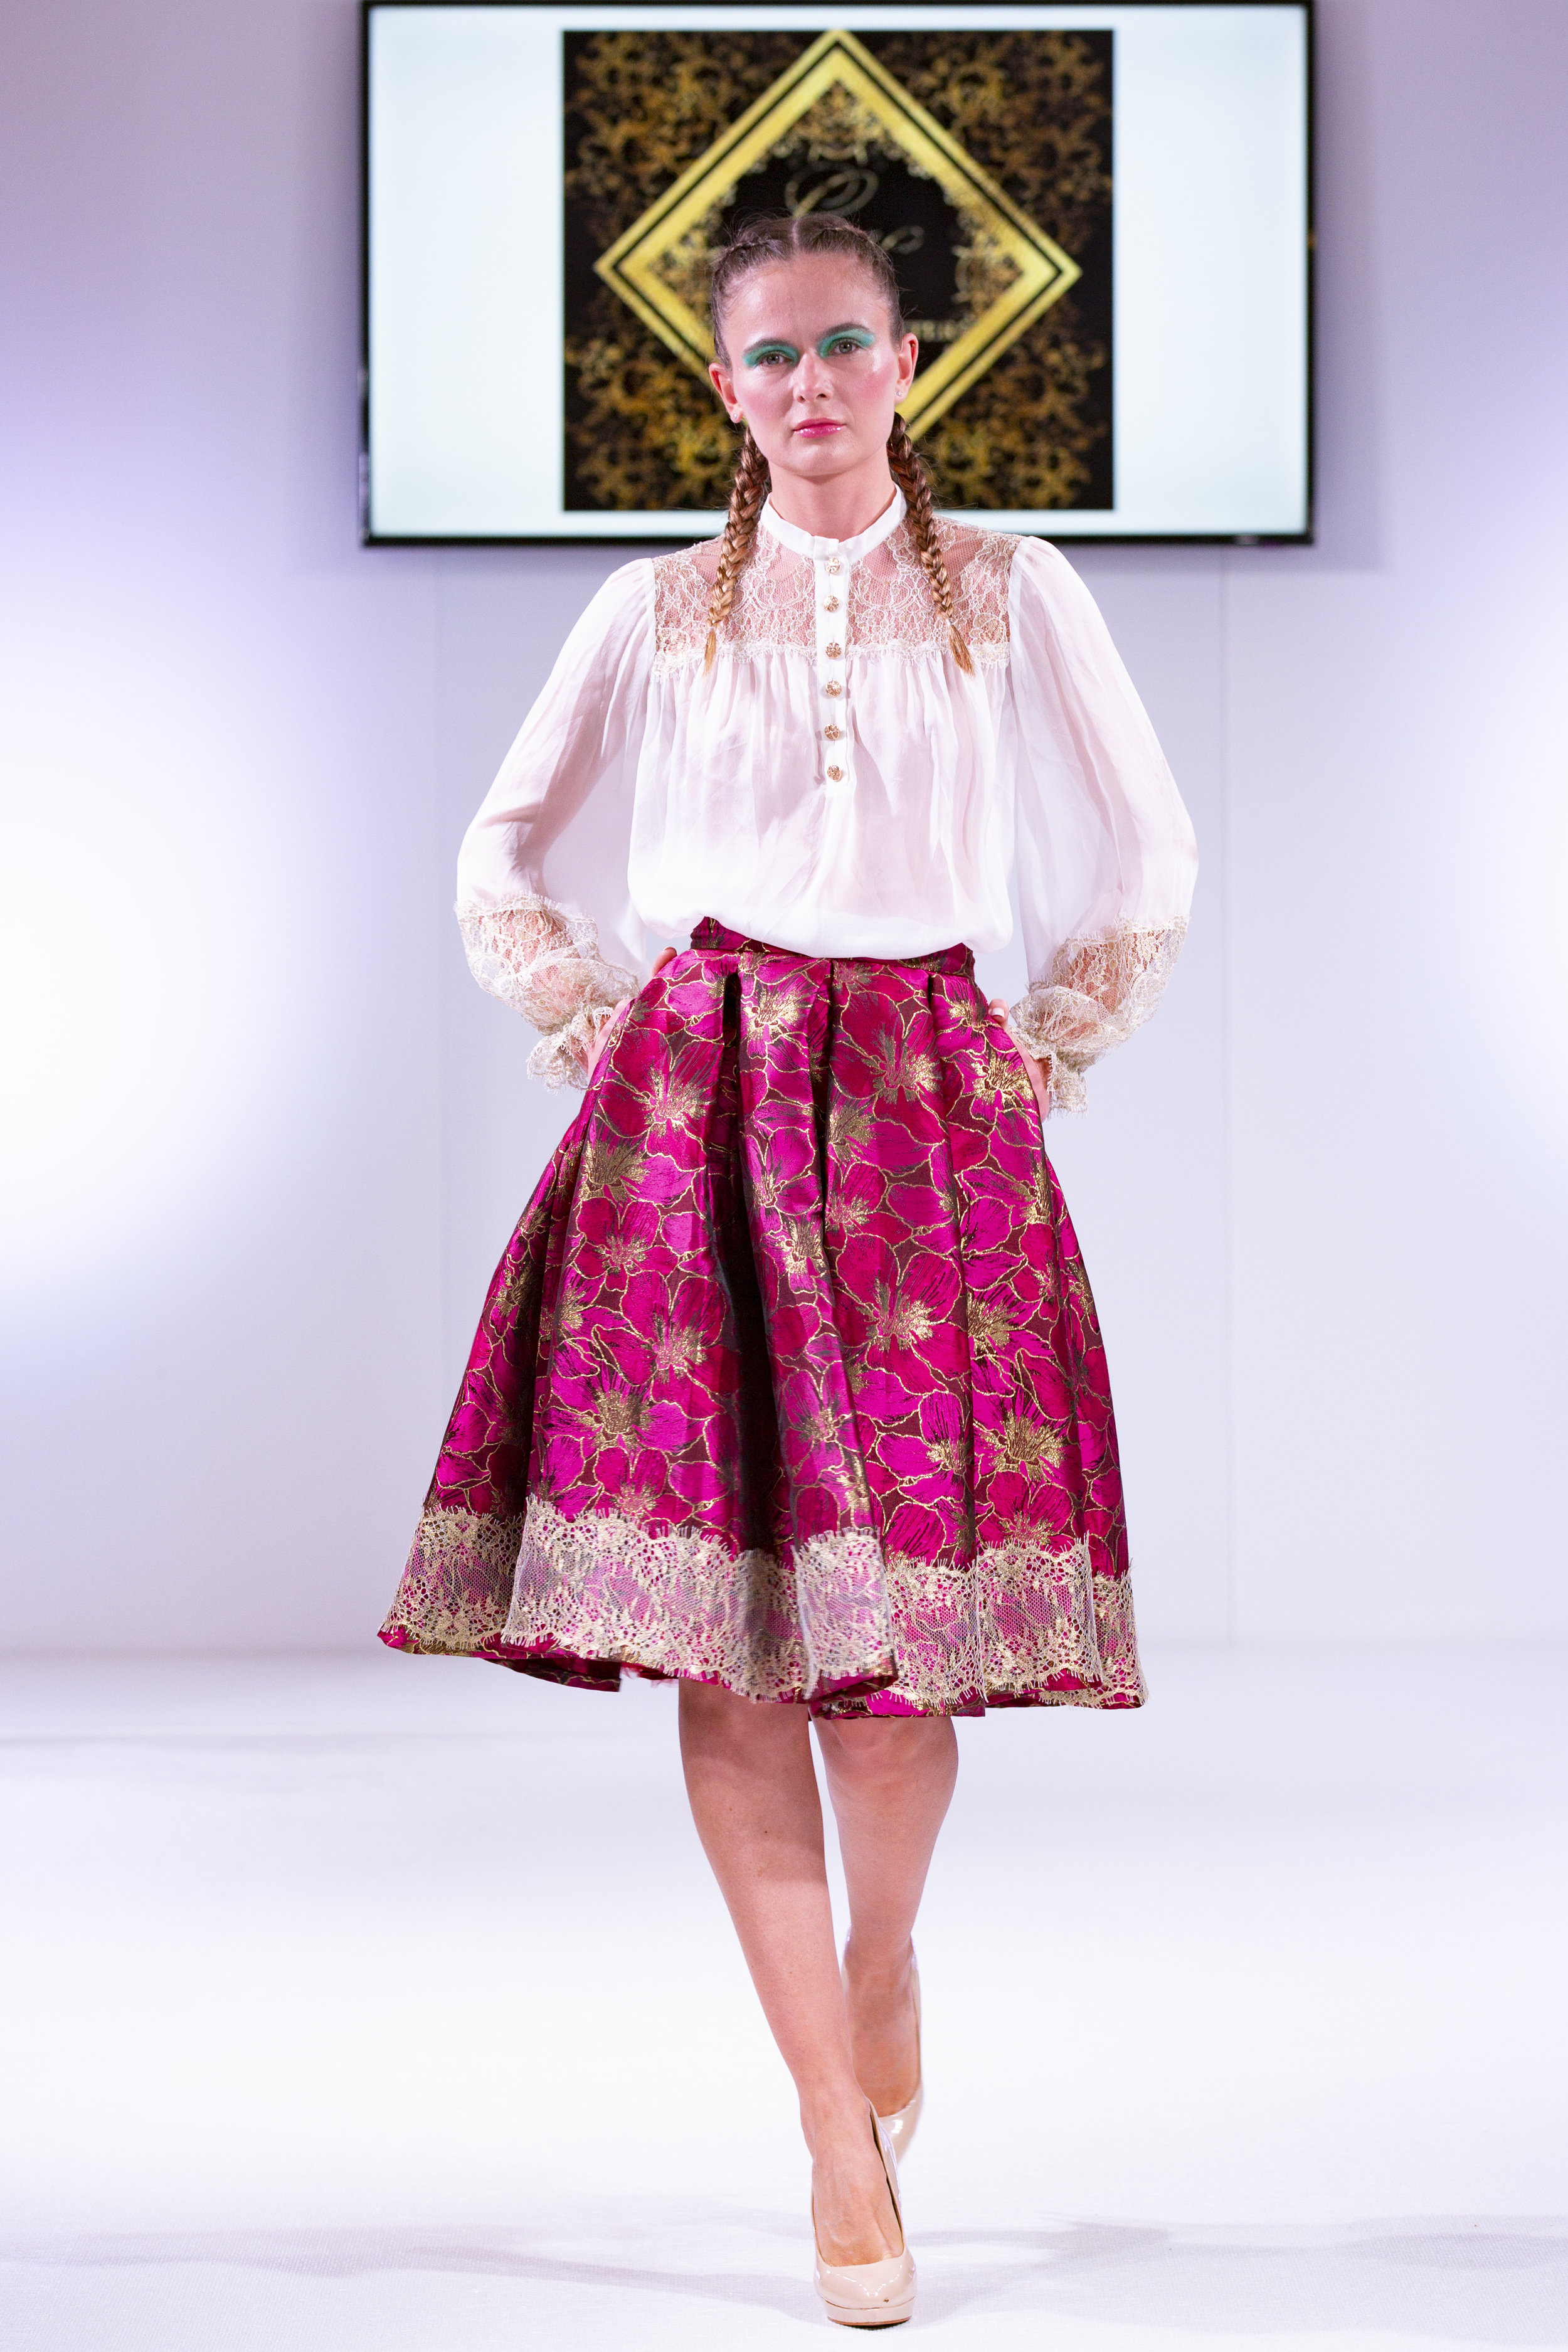 Fashions Finest 2019 -Glamour Hunter - Spain -Photographer - Joanna Mitroi